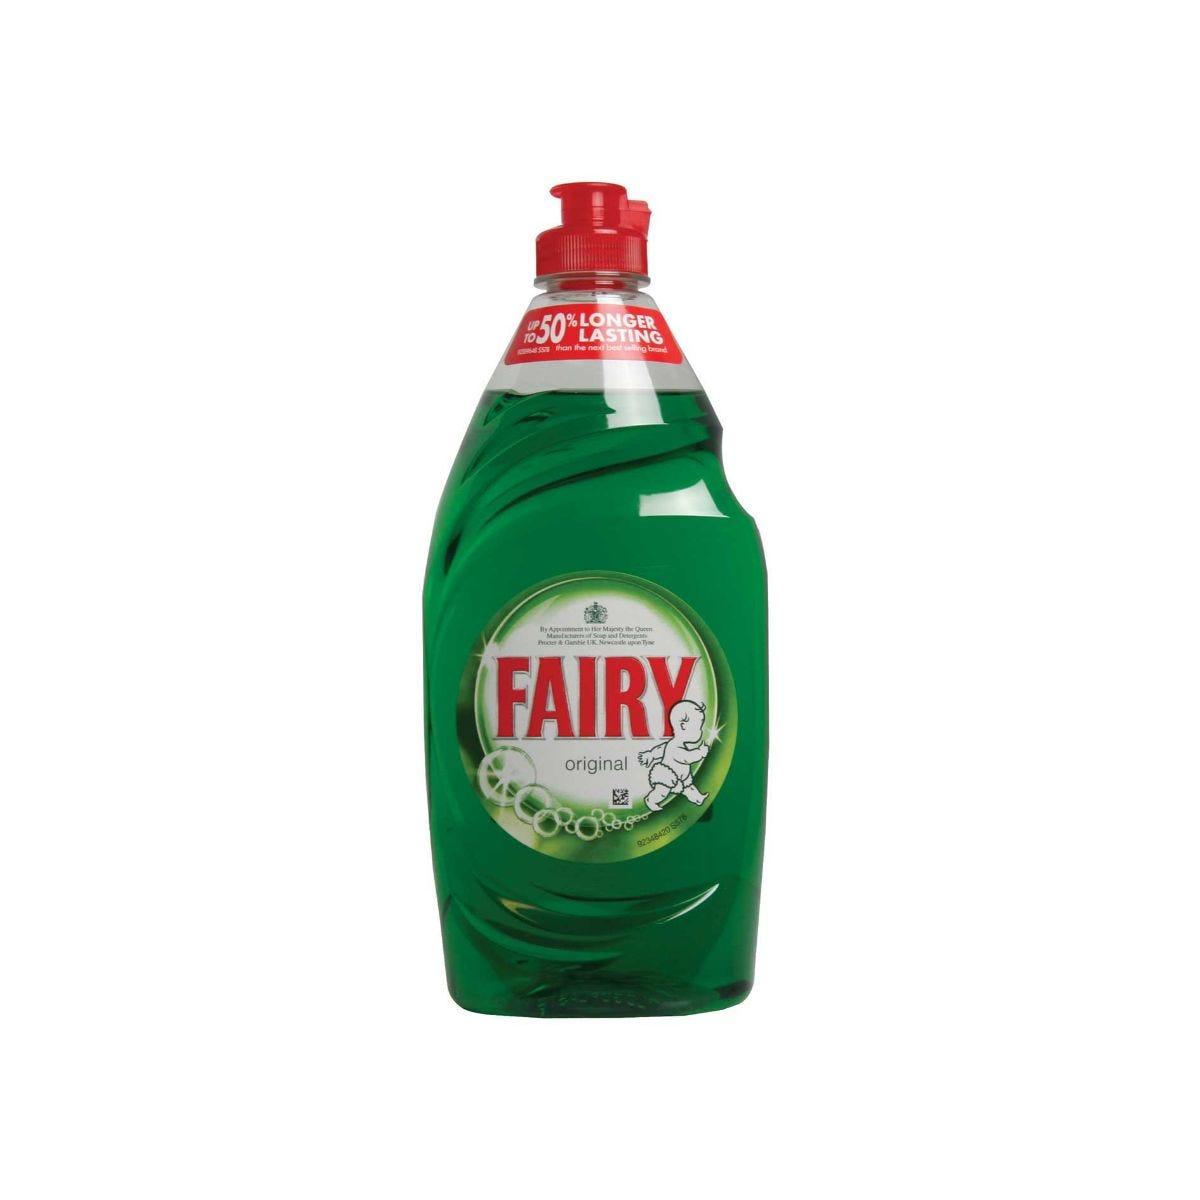 Fairy Washing Up Liquid 500ml.